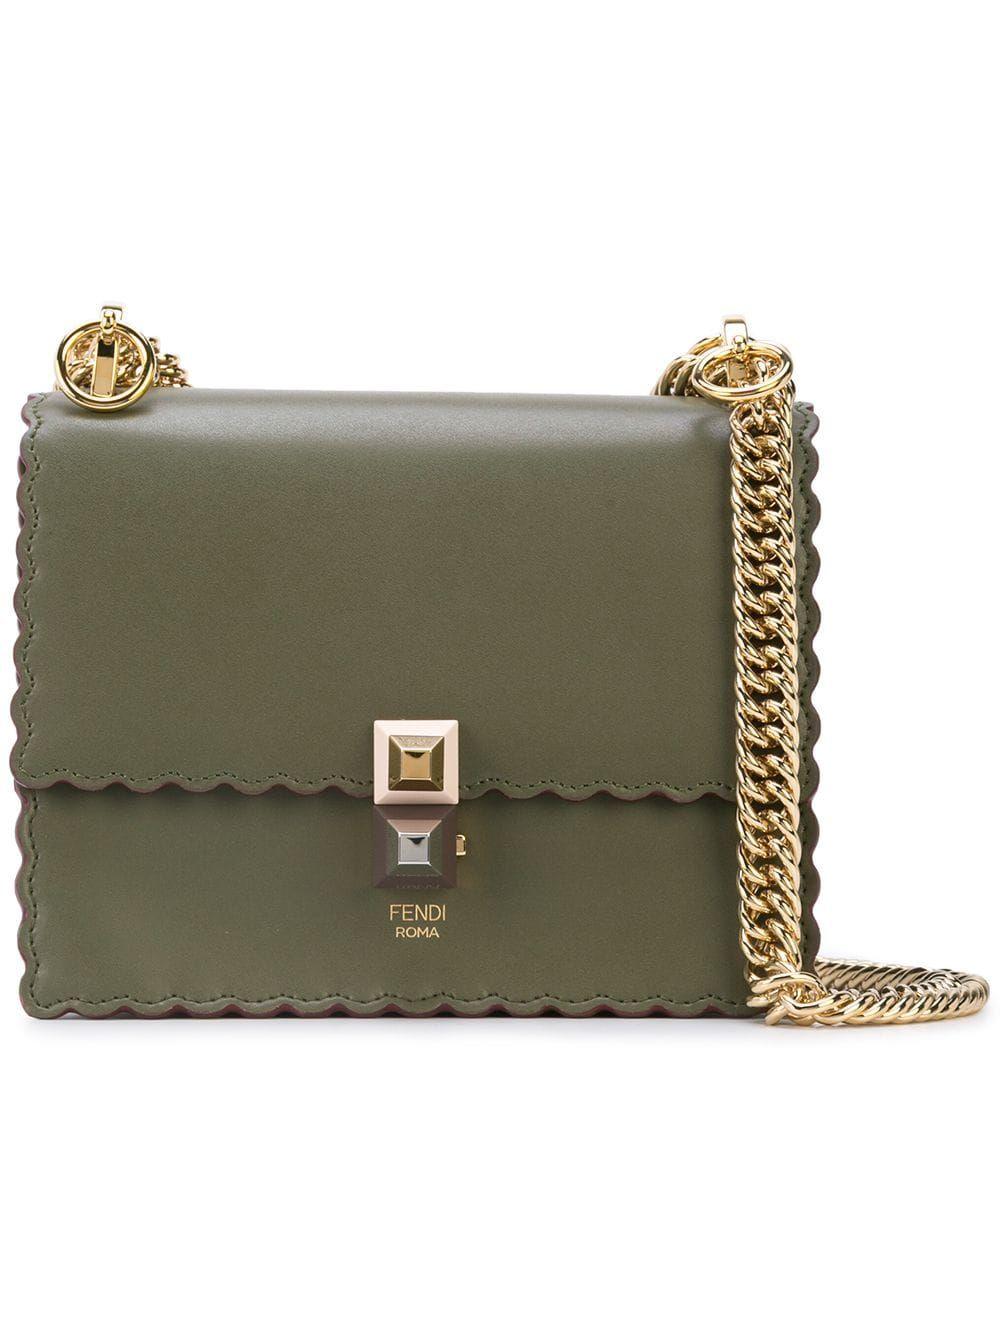 25b015bba9b Fendi mini shoulder bag - Green in 2019 | Products | Bags, Shoulder ...